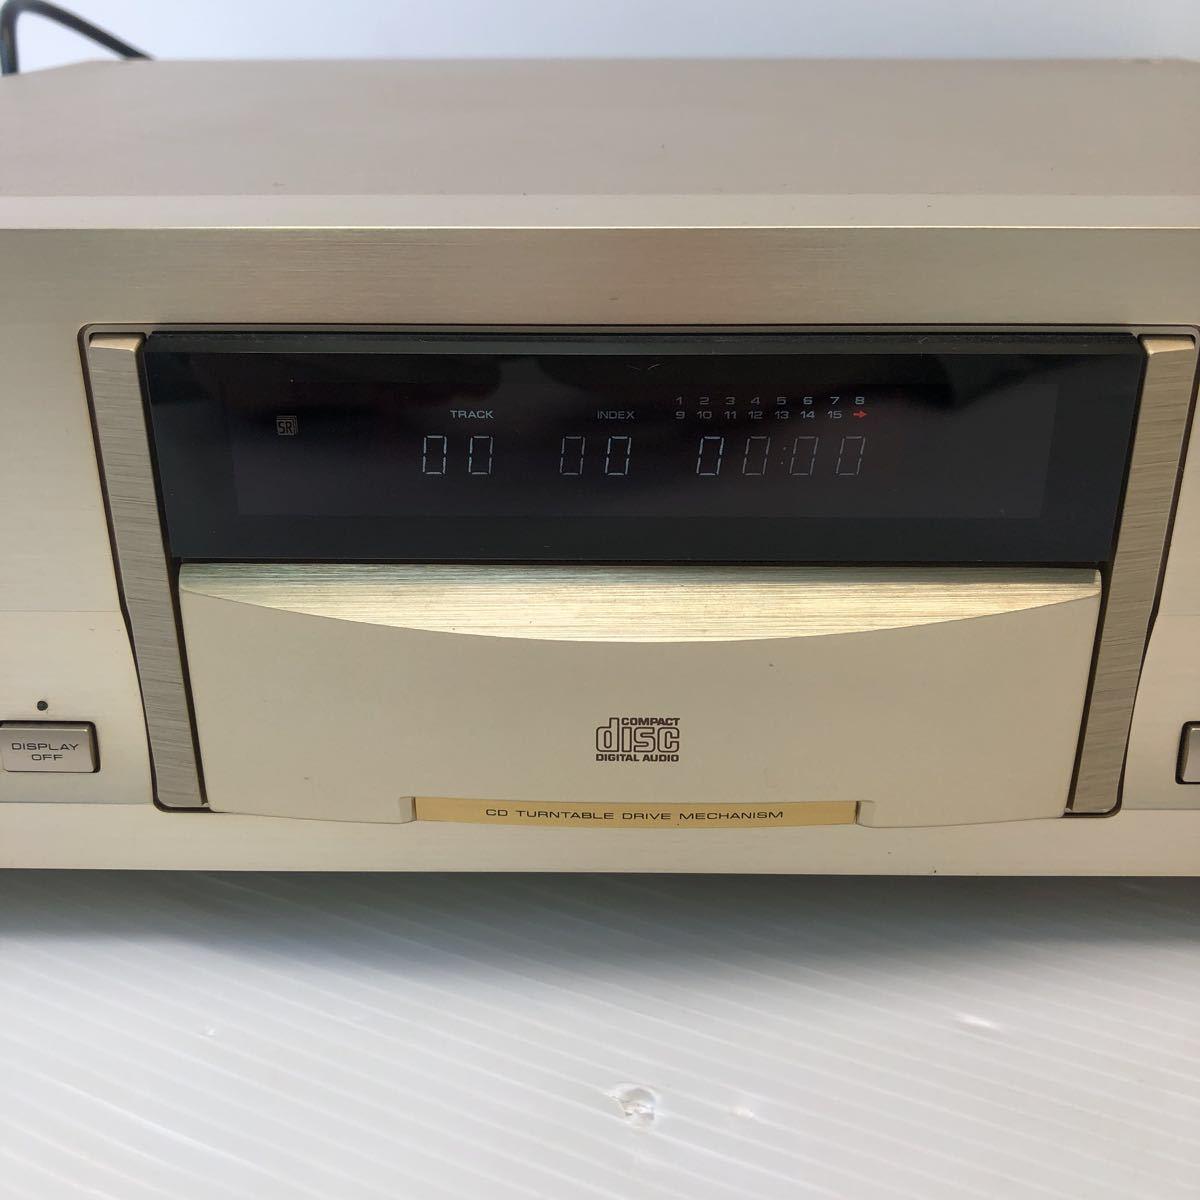 Pioneer パイオニア CDプレーヤー DACモード搭載 通電 CDトレイオープンクローズのみ確認 ジャンク扱い リモコン付き 1円スタート_画像2